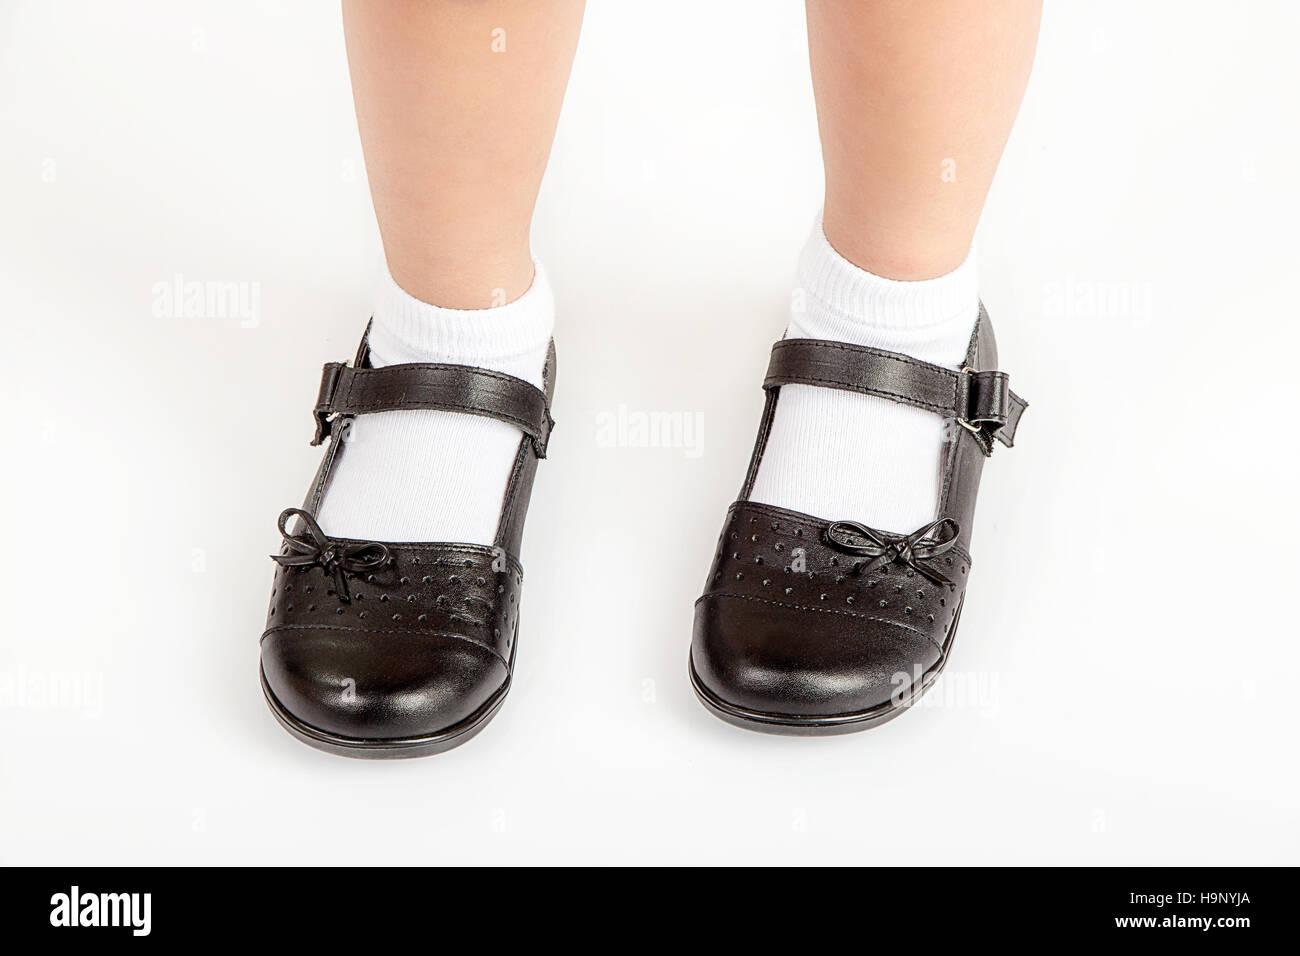 School Girl Student Wearing Black Shoes